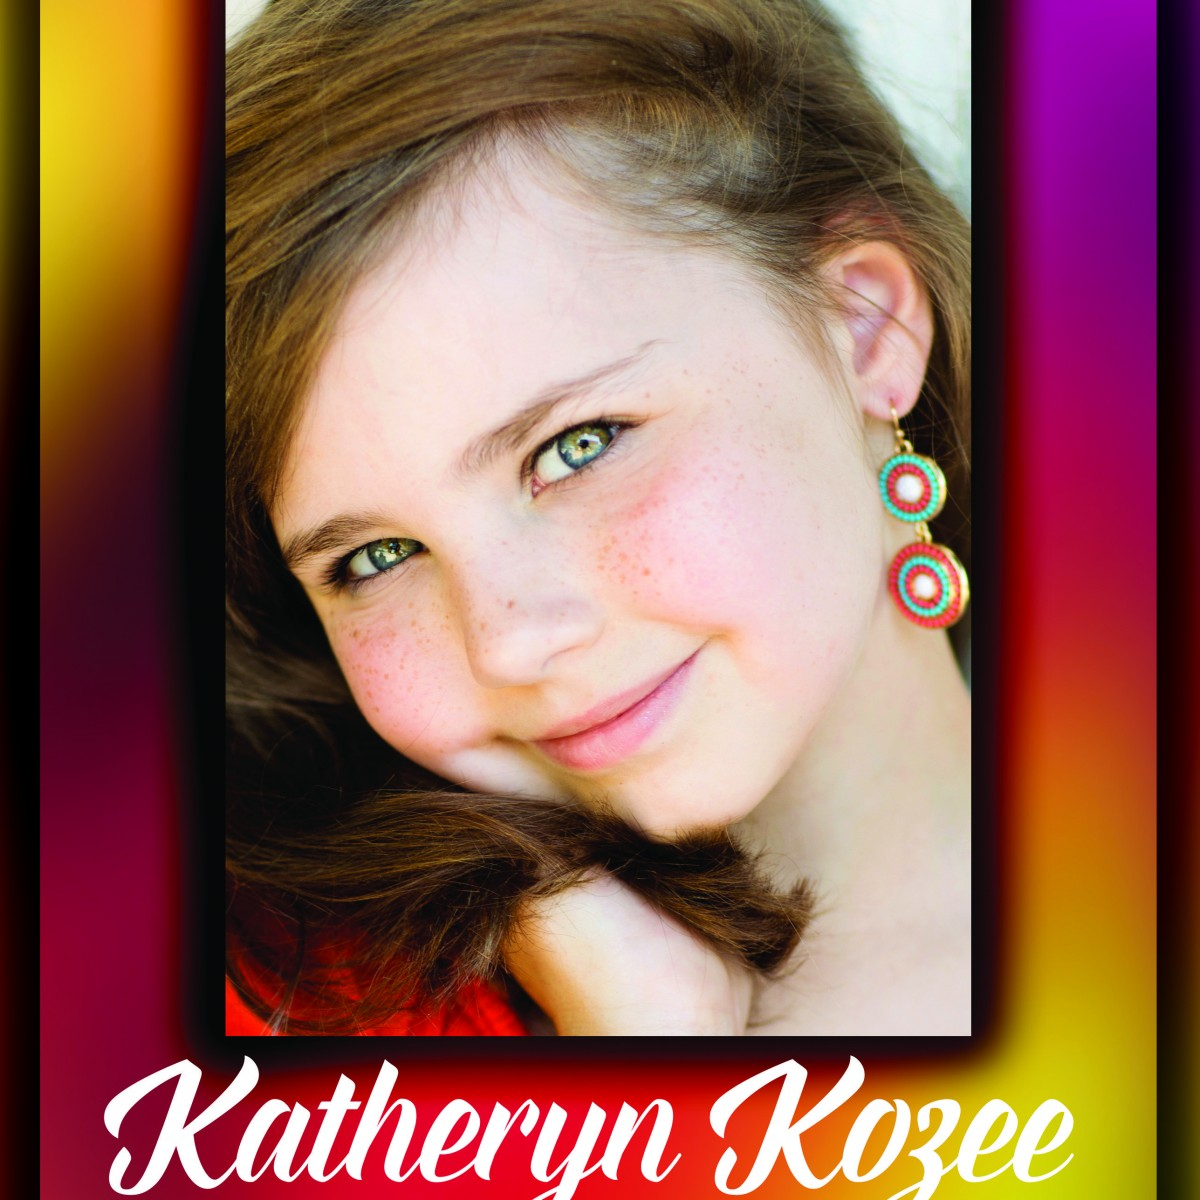 Katheryn Kozee